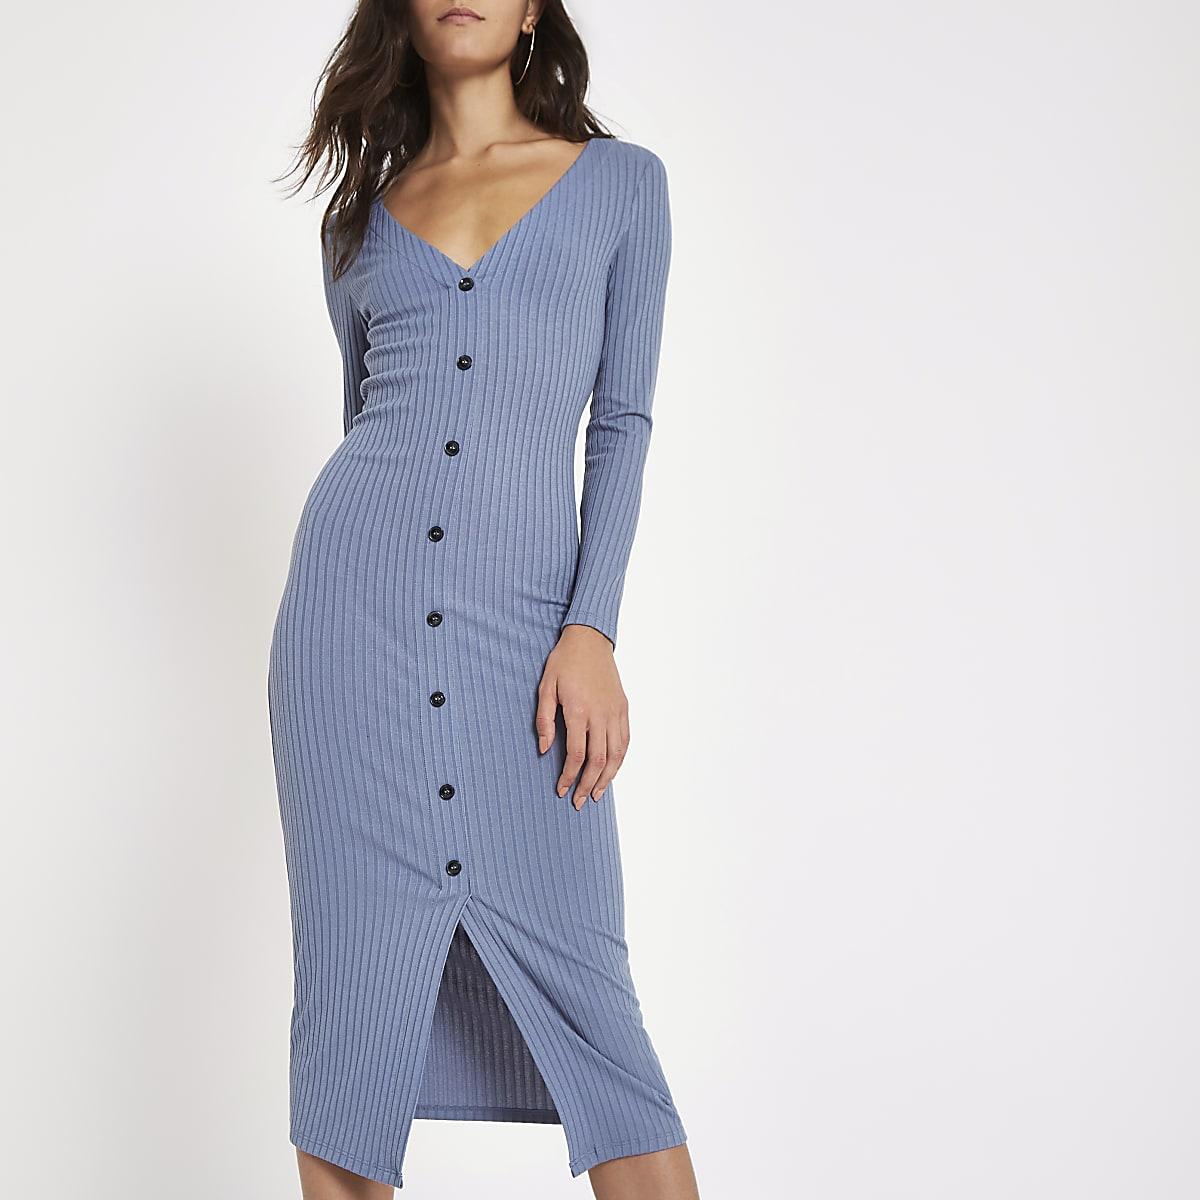 fbcb6d77333ff Light blue ribbed button front bodycon dress - Bodycon Dresses ...